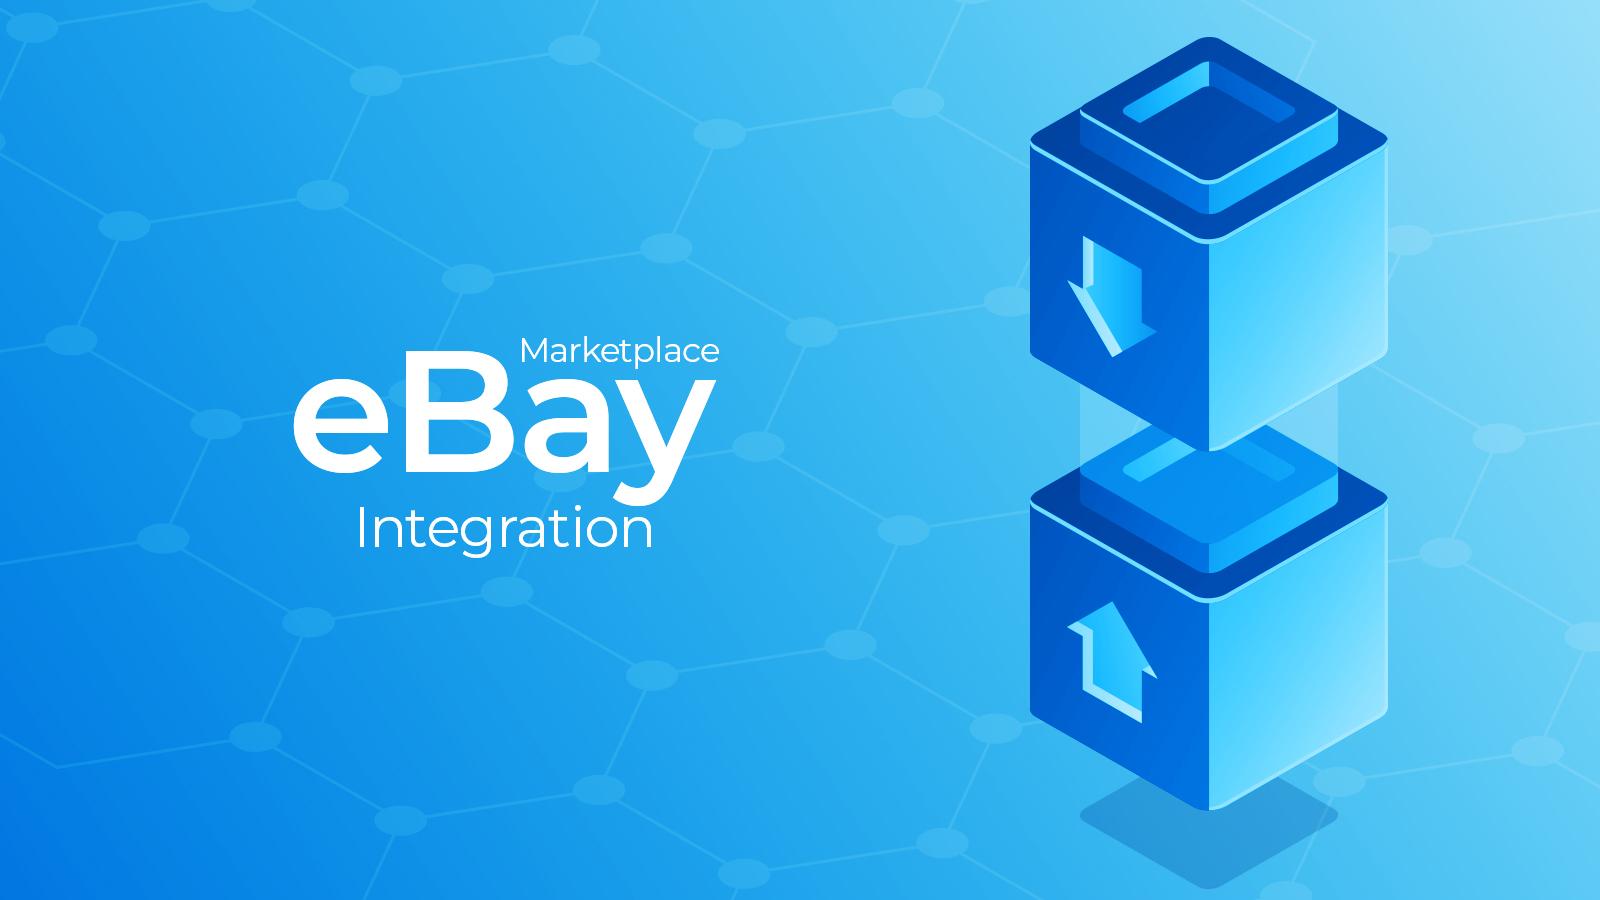 ebay marketplace integration